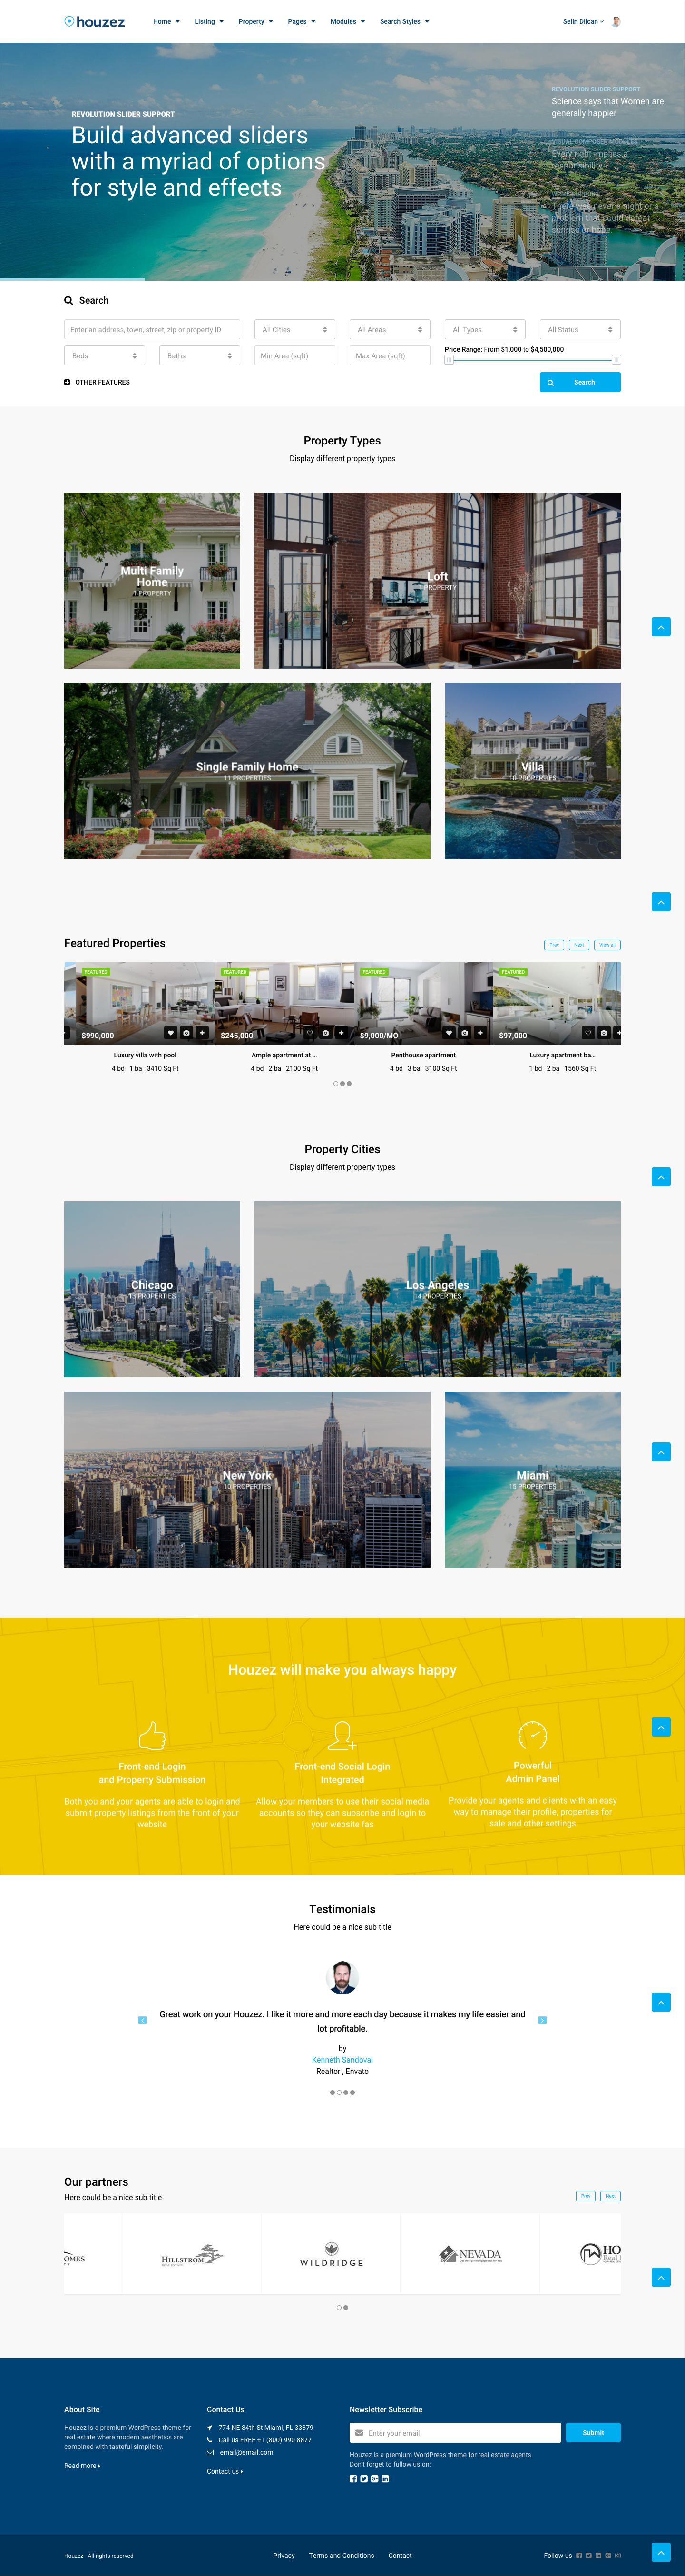 Houzez Real Estate Wordpress Theme By Favethemes Themeforest